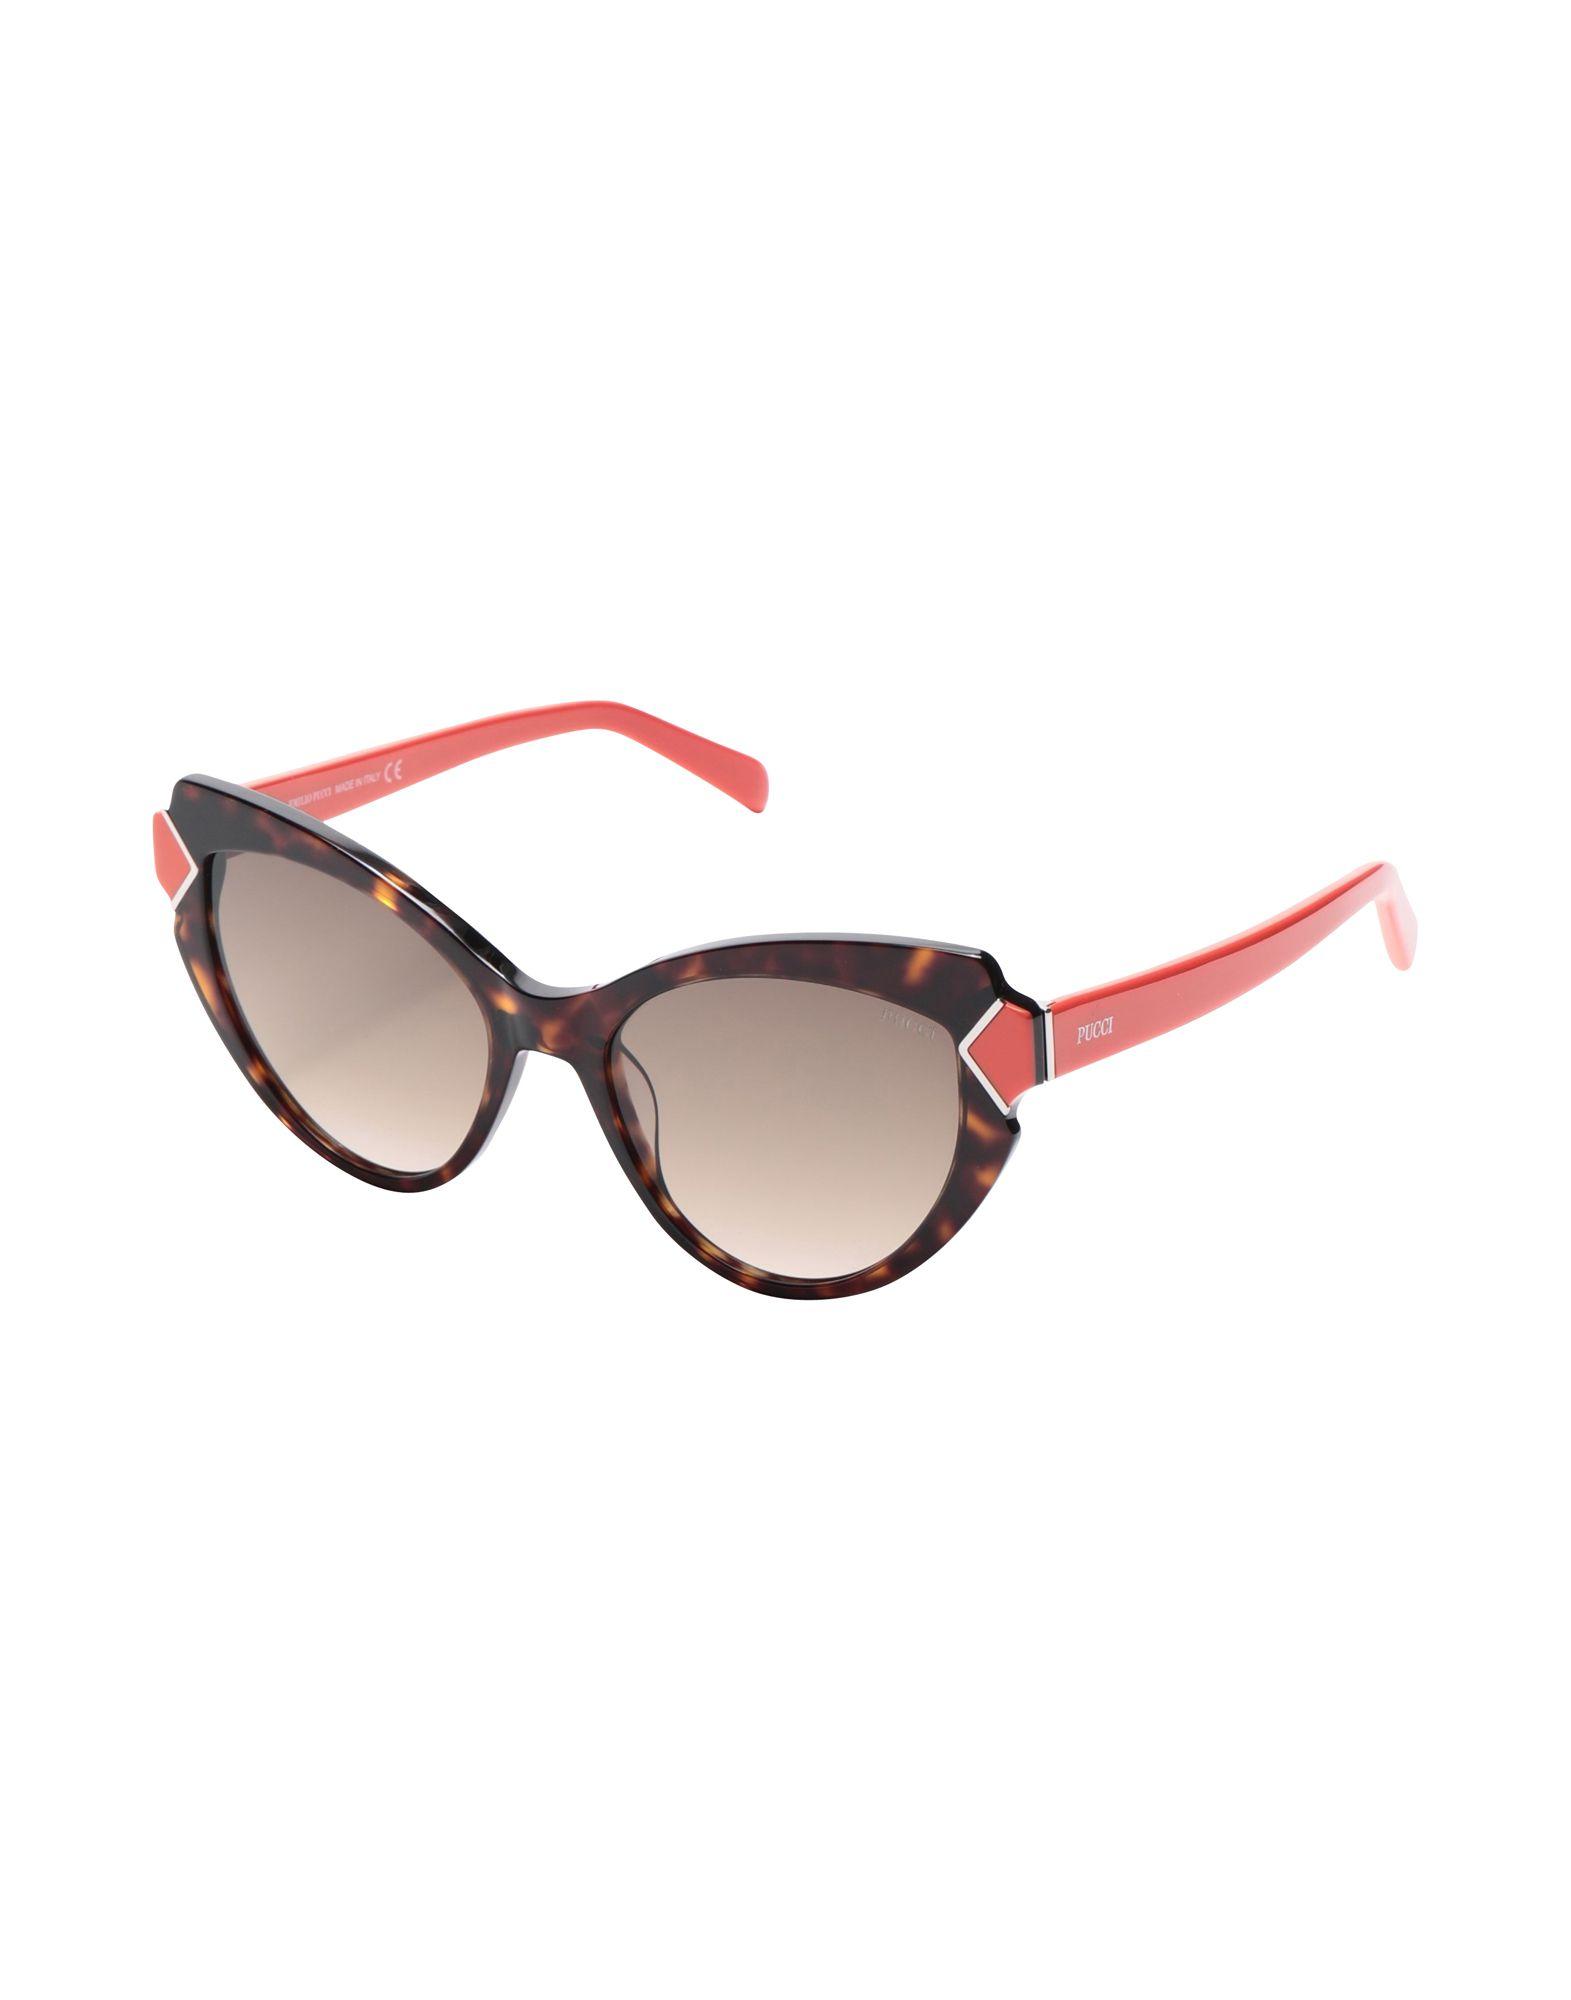 Фото - EMILIO PUCCI Солнечные очки 3d очки